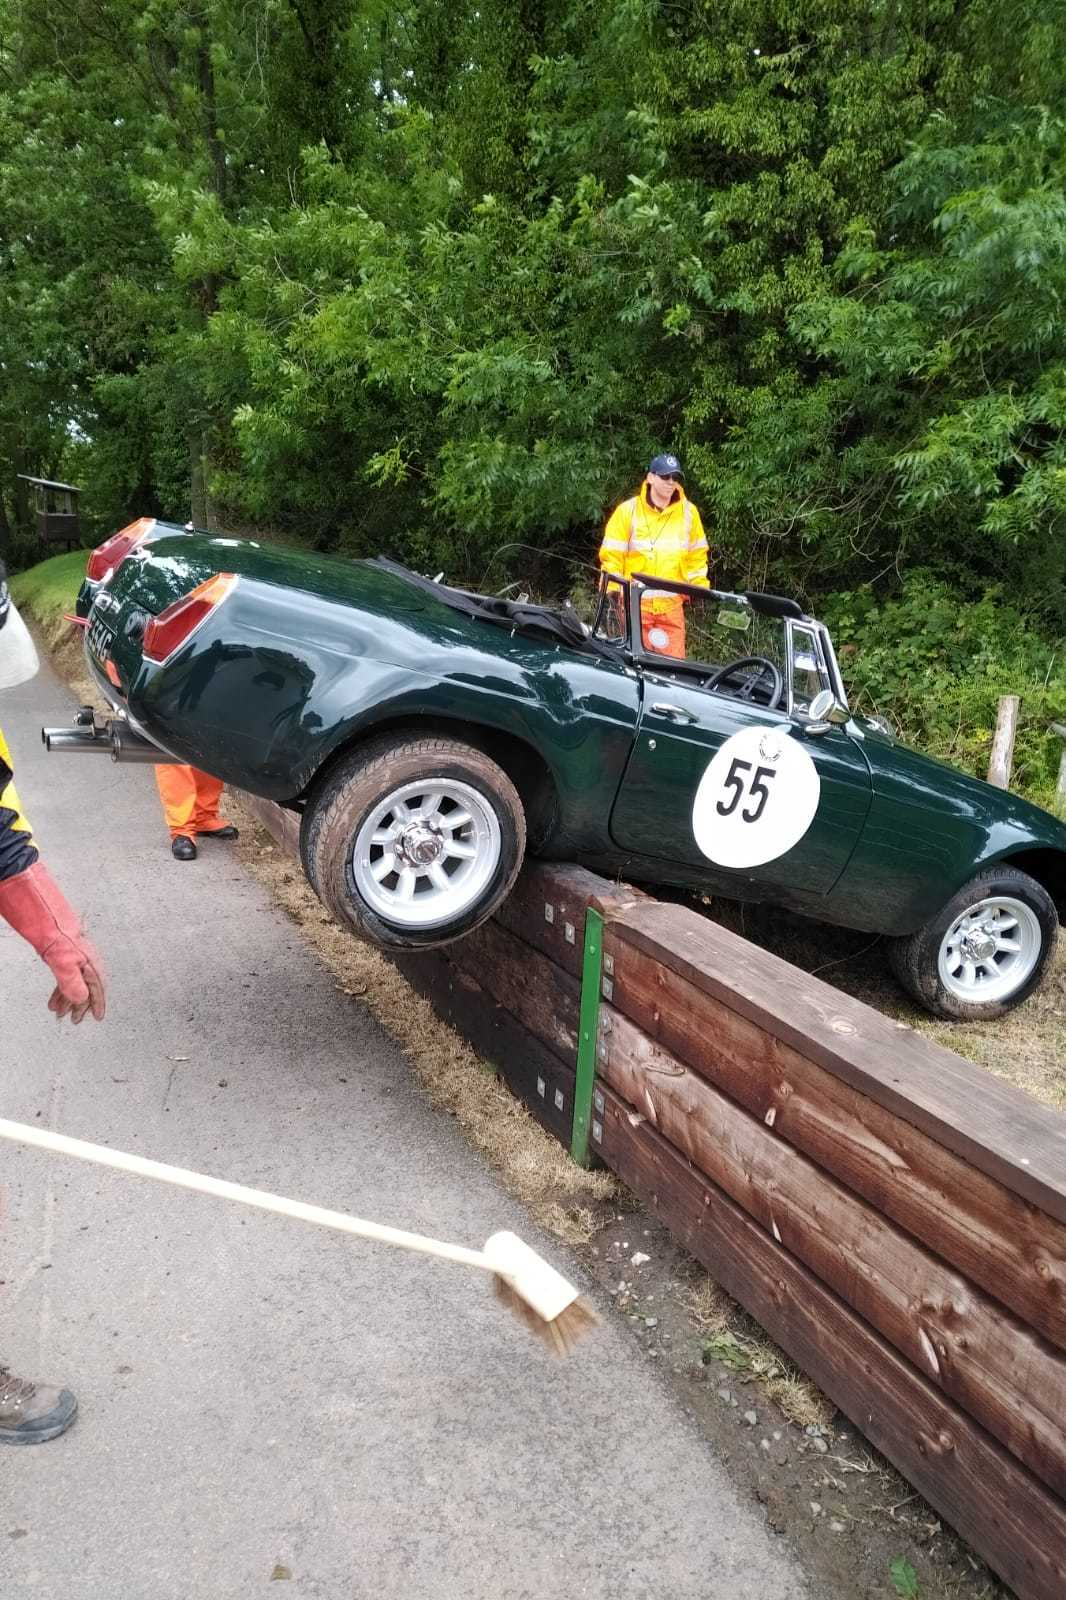 Council chairman crashed his car at hill climb event